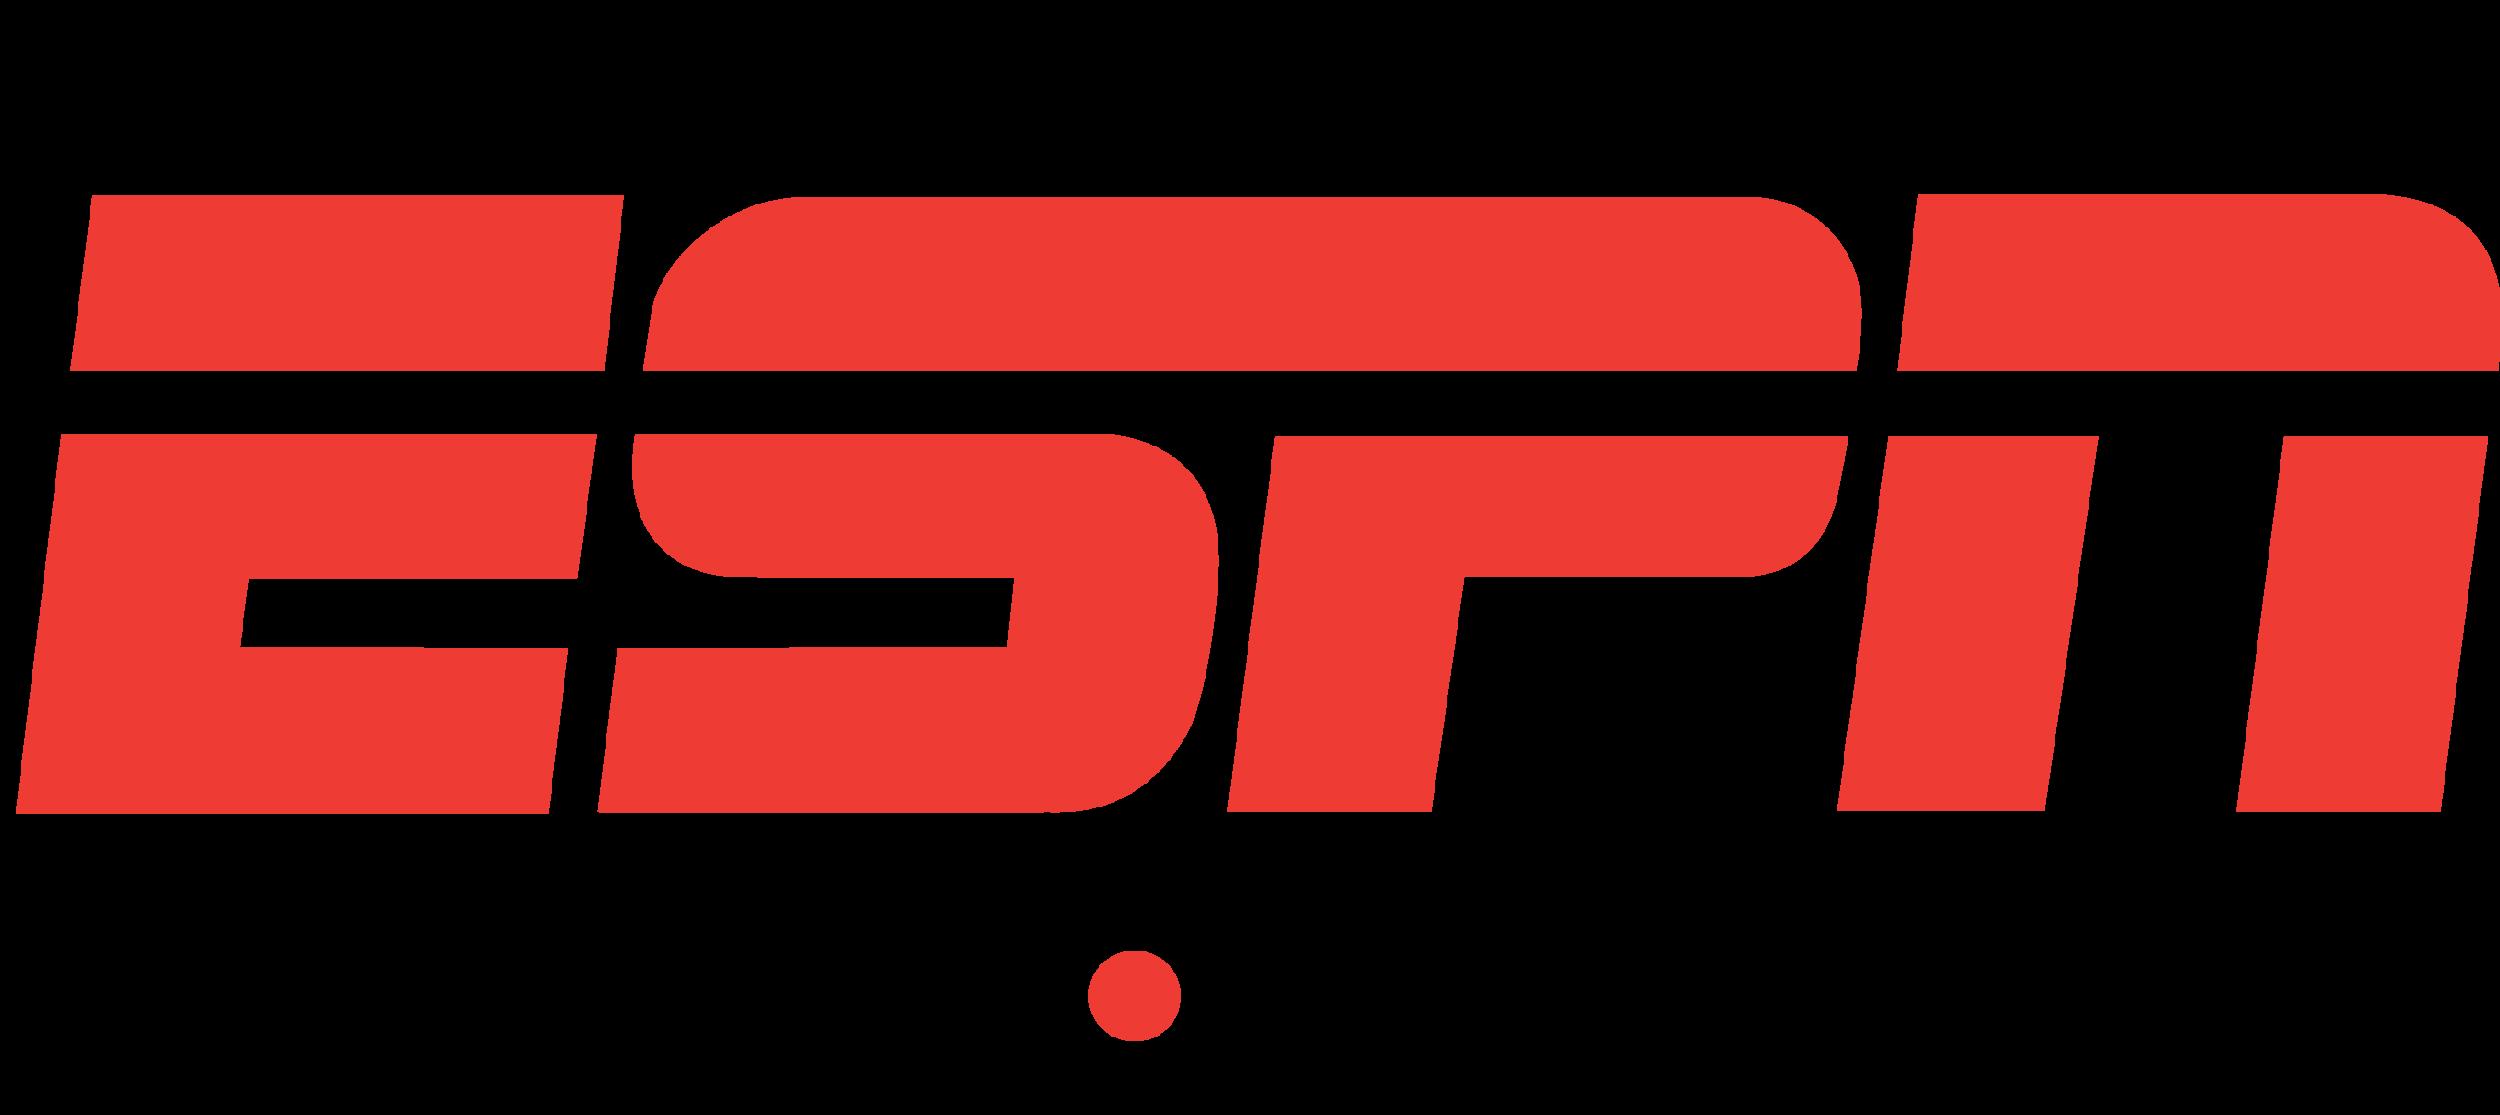 espnradio_logo_1021.png